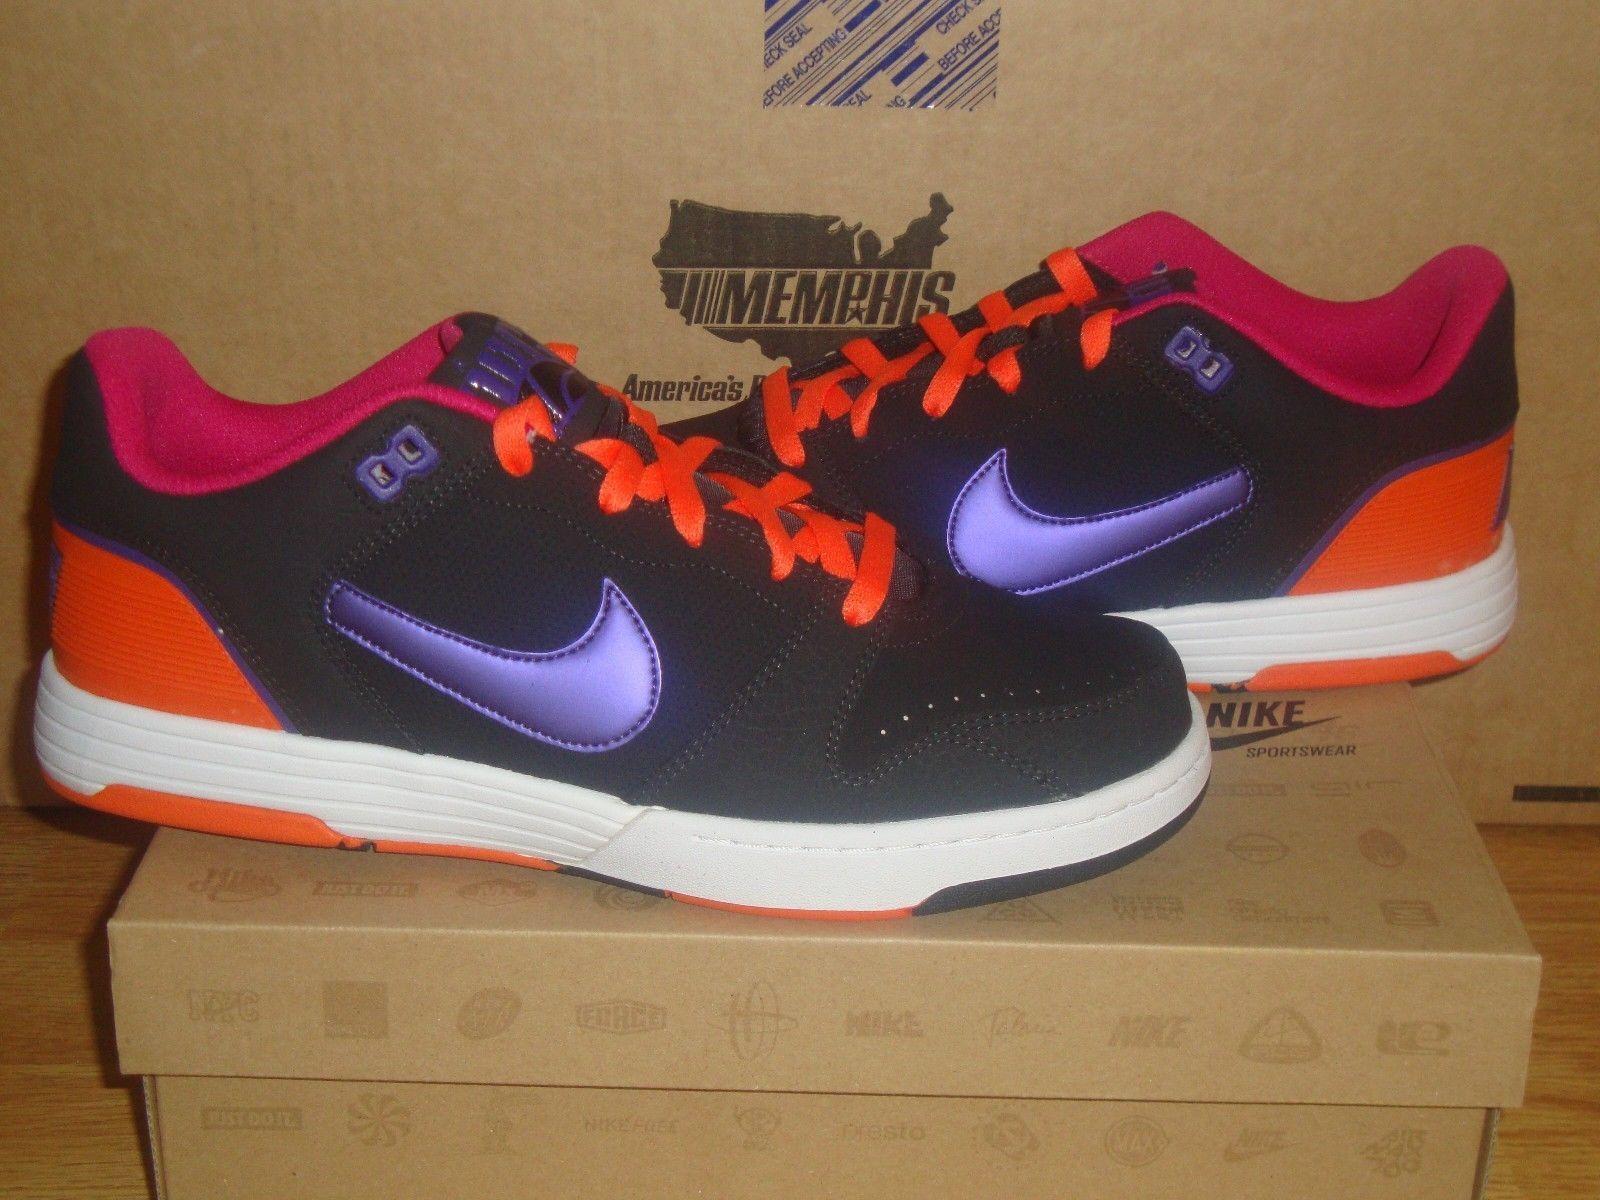 Nike Mach Force Low Black Purple Skate Shoes Dunk SB 525313-050 SWEET SHOE SKUNK